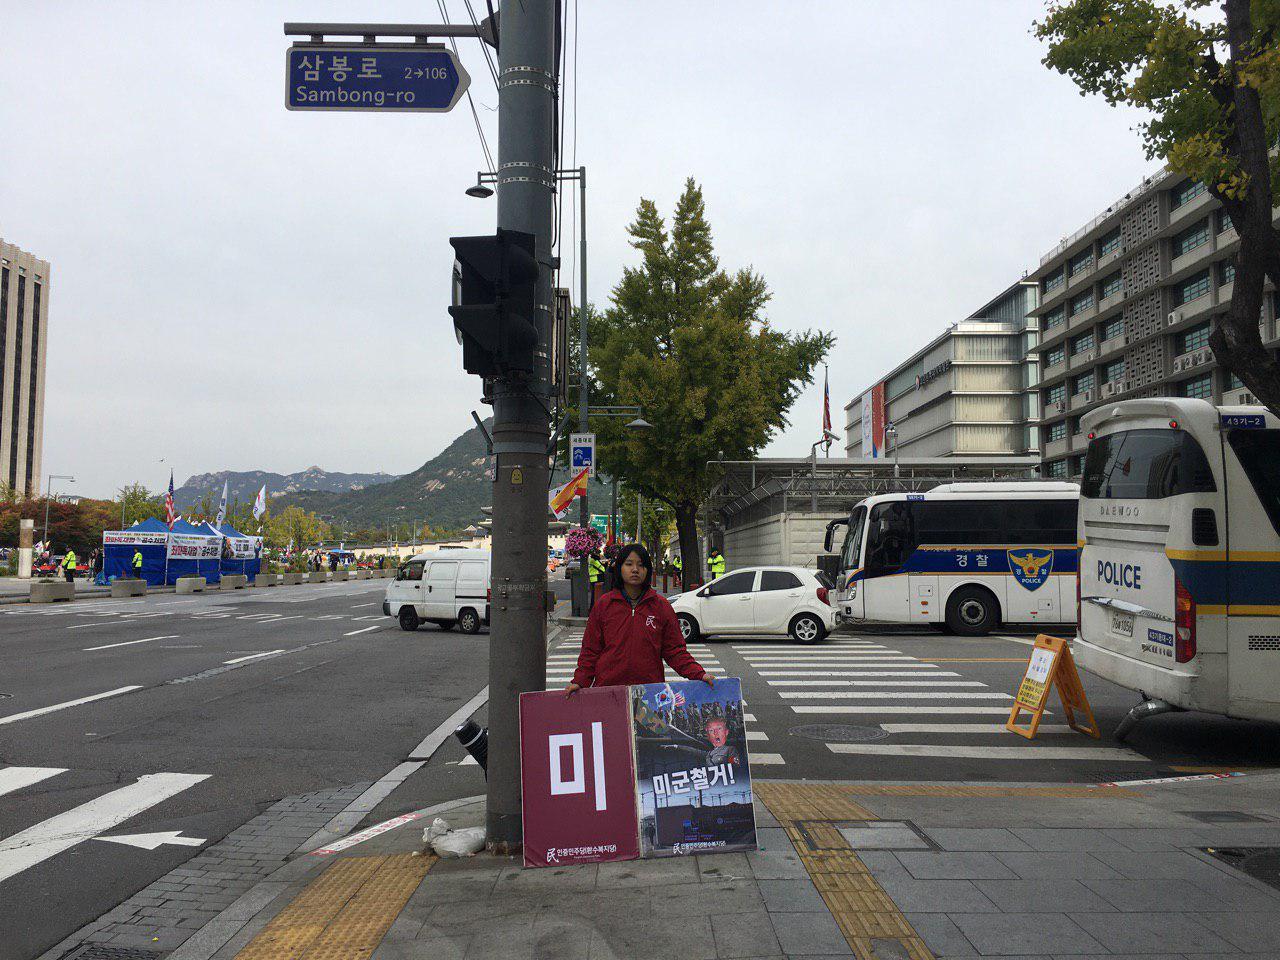 photo_2019-10-23_03-52-42.jpg